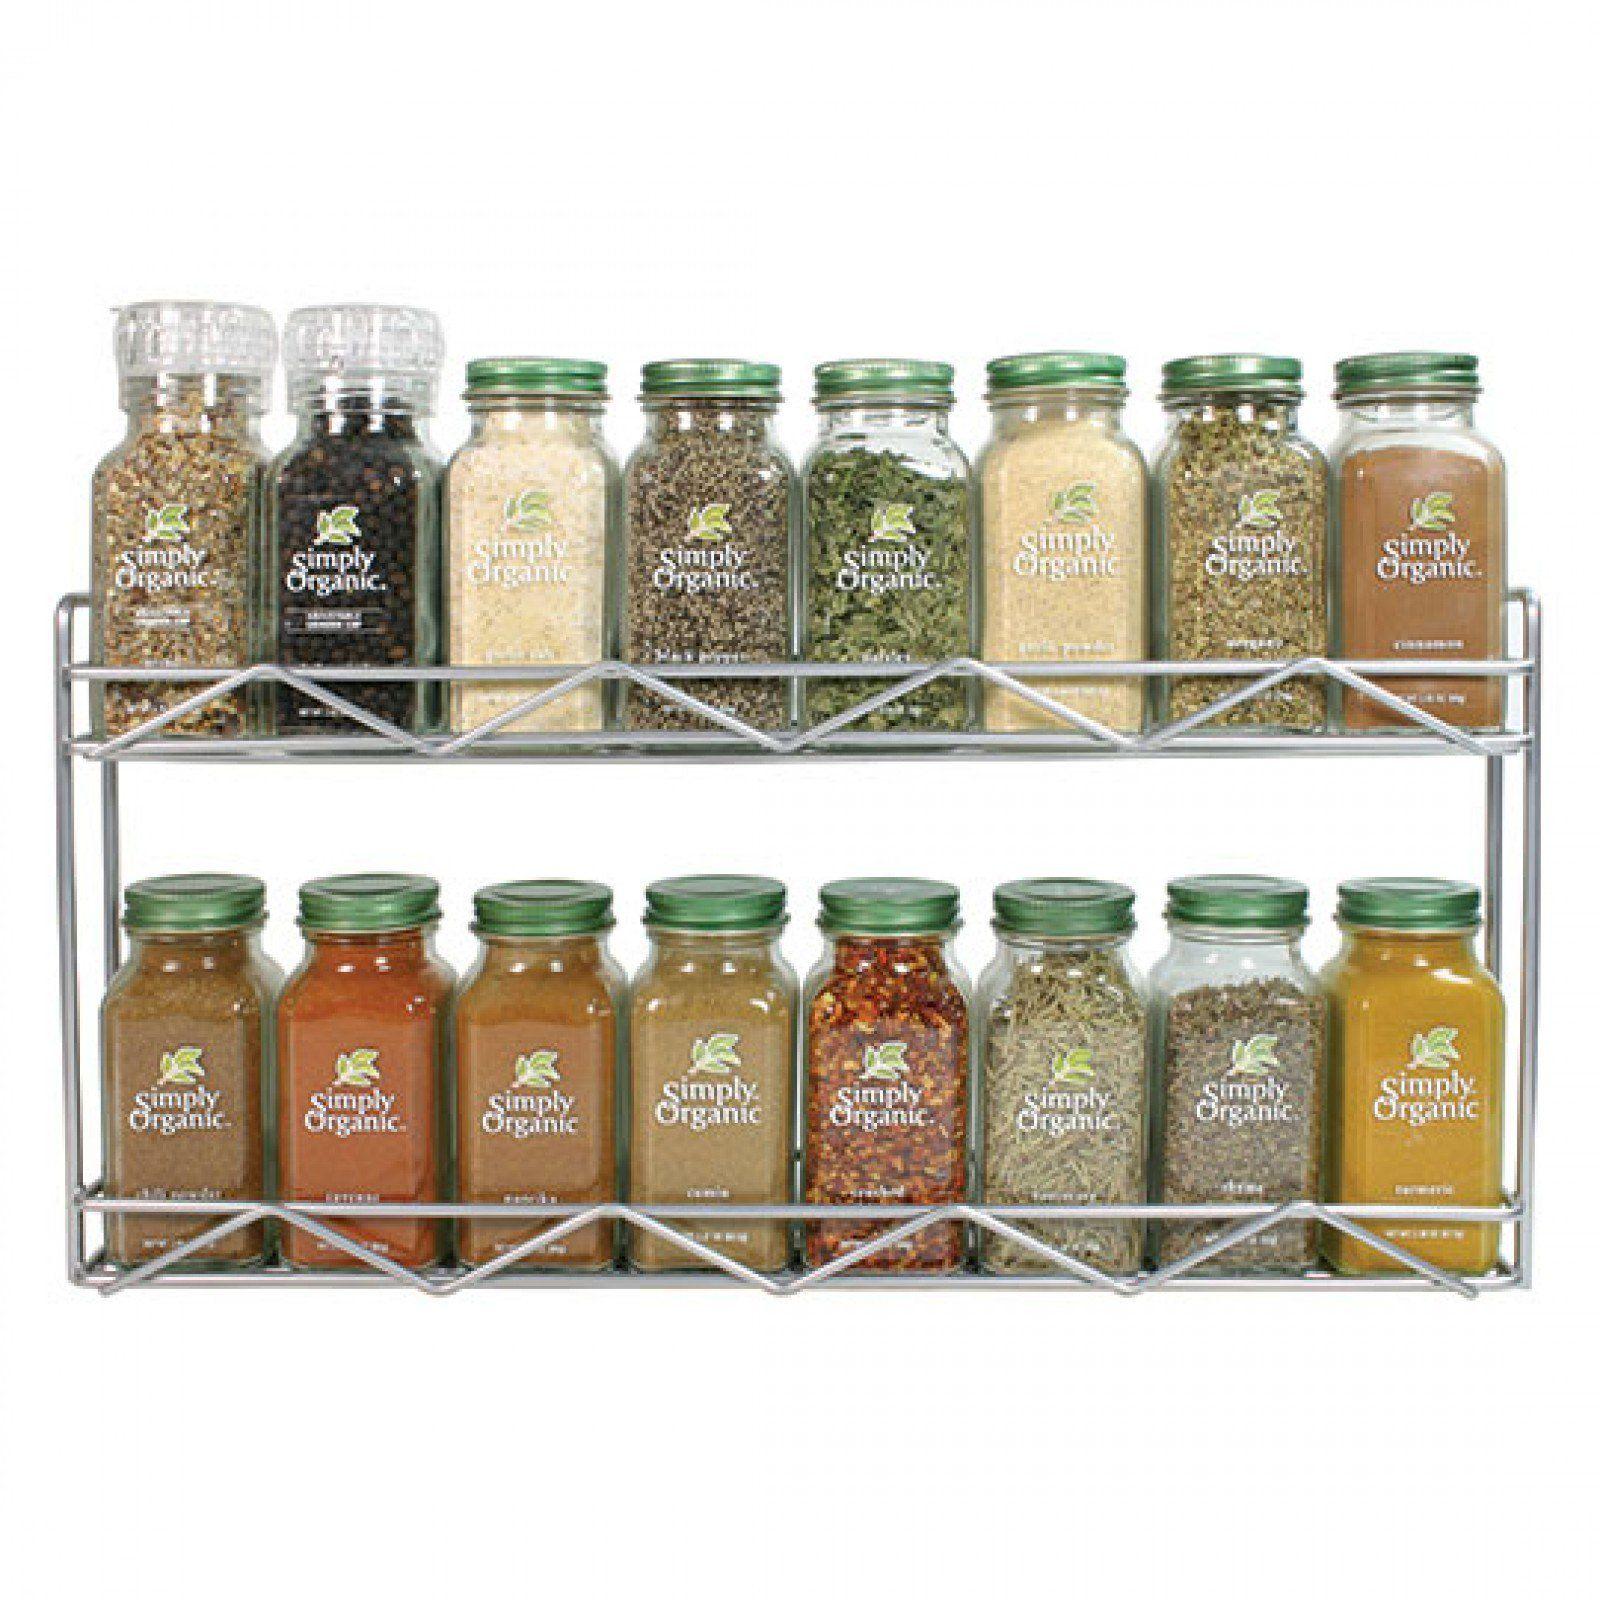 Organic Spice Rack Entrancing Simply Organic 16Count Spice Rack  Simply Organic  Christmas Inspiration